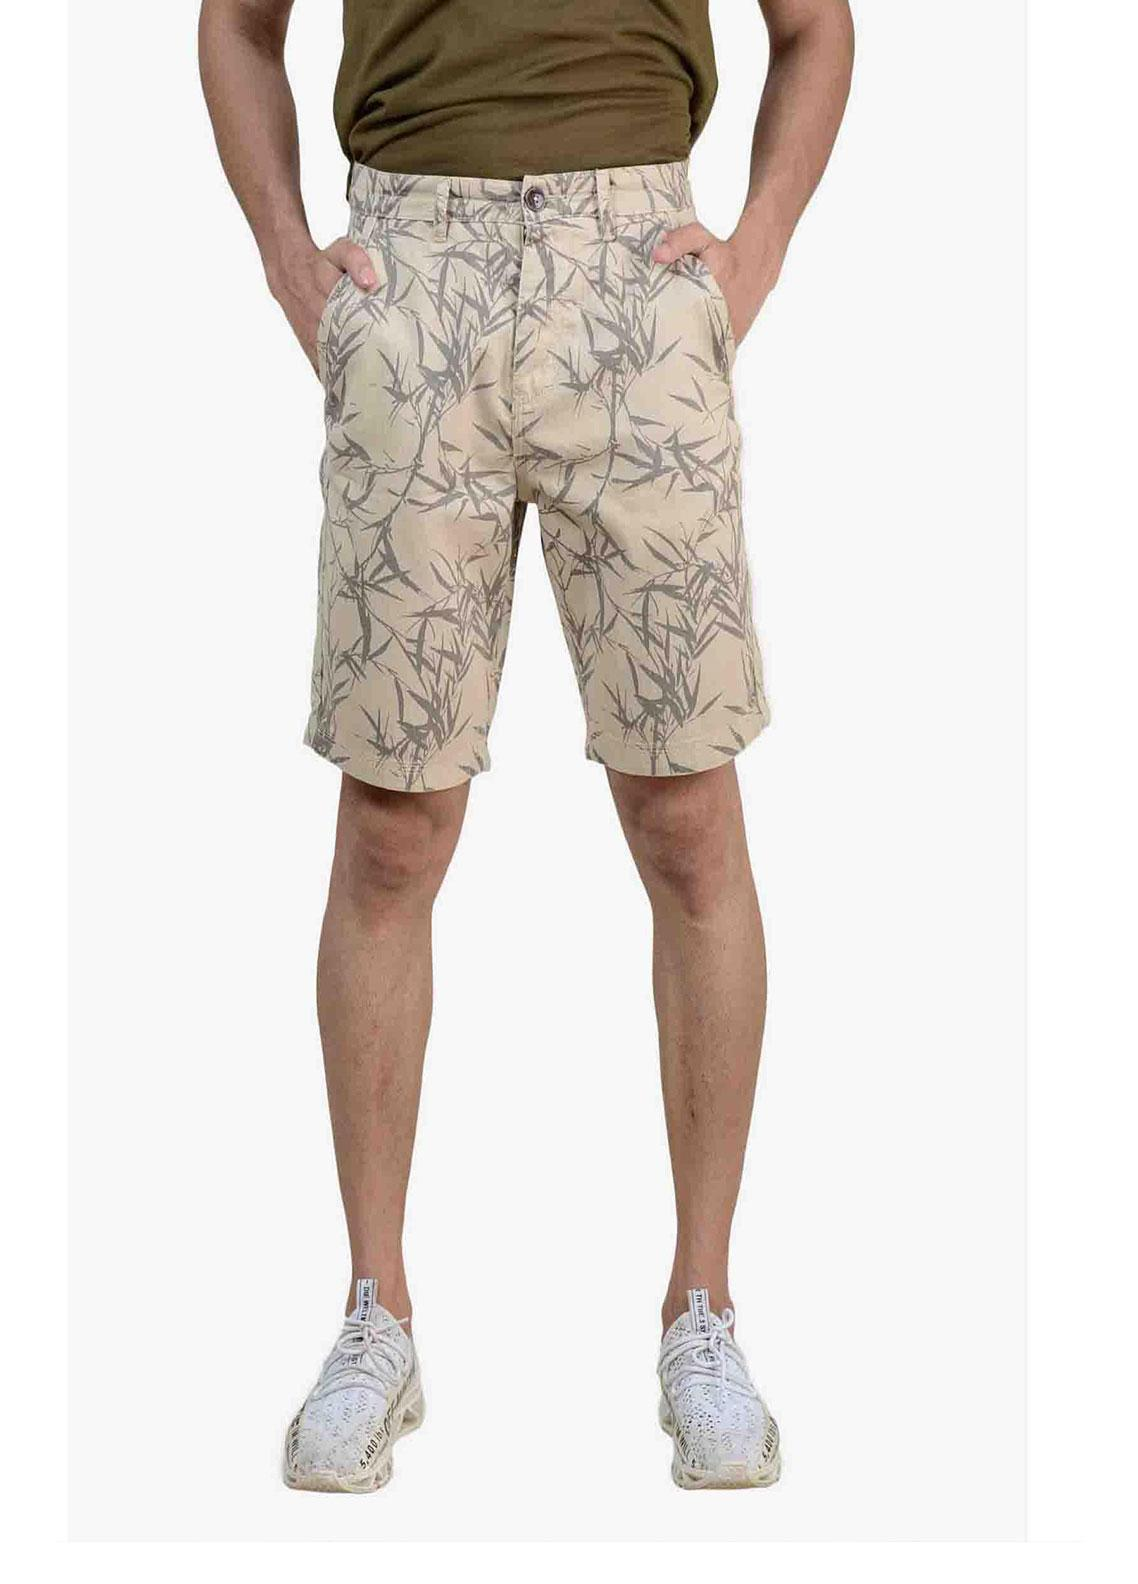 Ignite Wardrobe Cotton Printed Shorts for Men -  IG20SOM 007